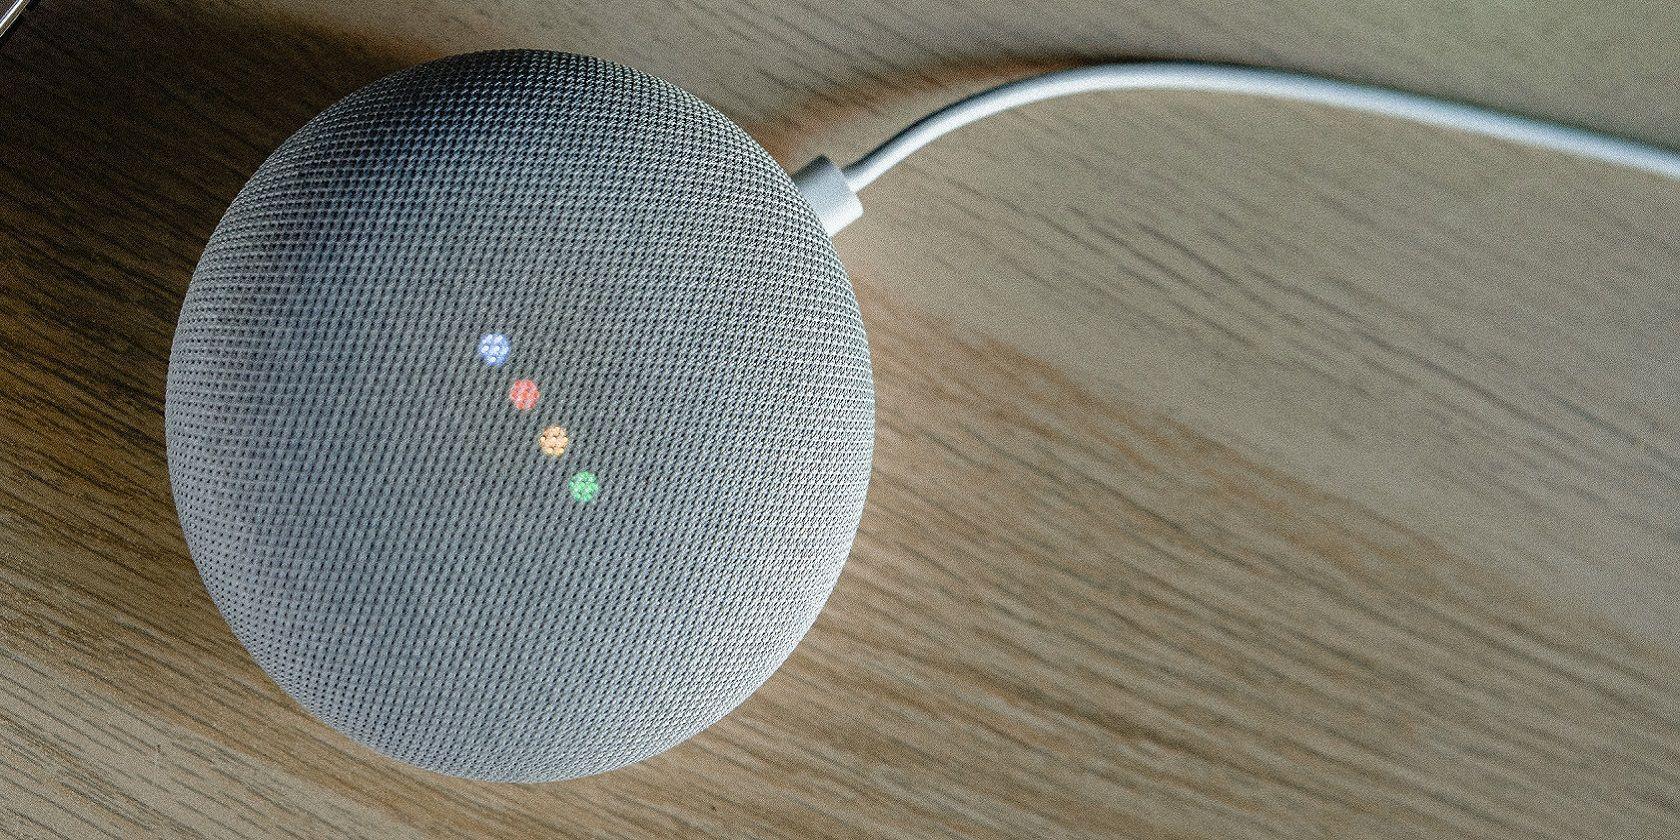 Google Home Mini vs. Google Nest Mini: What Are the Differences?